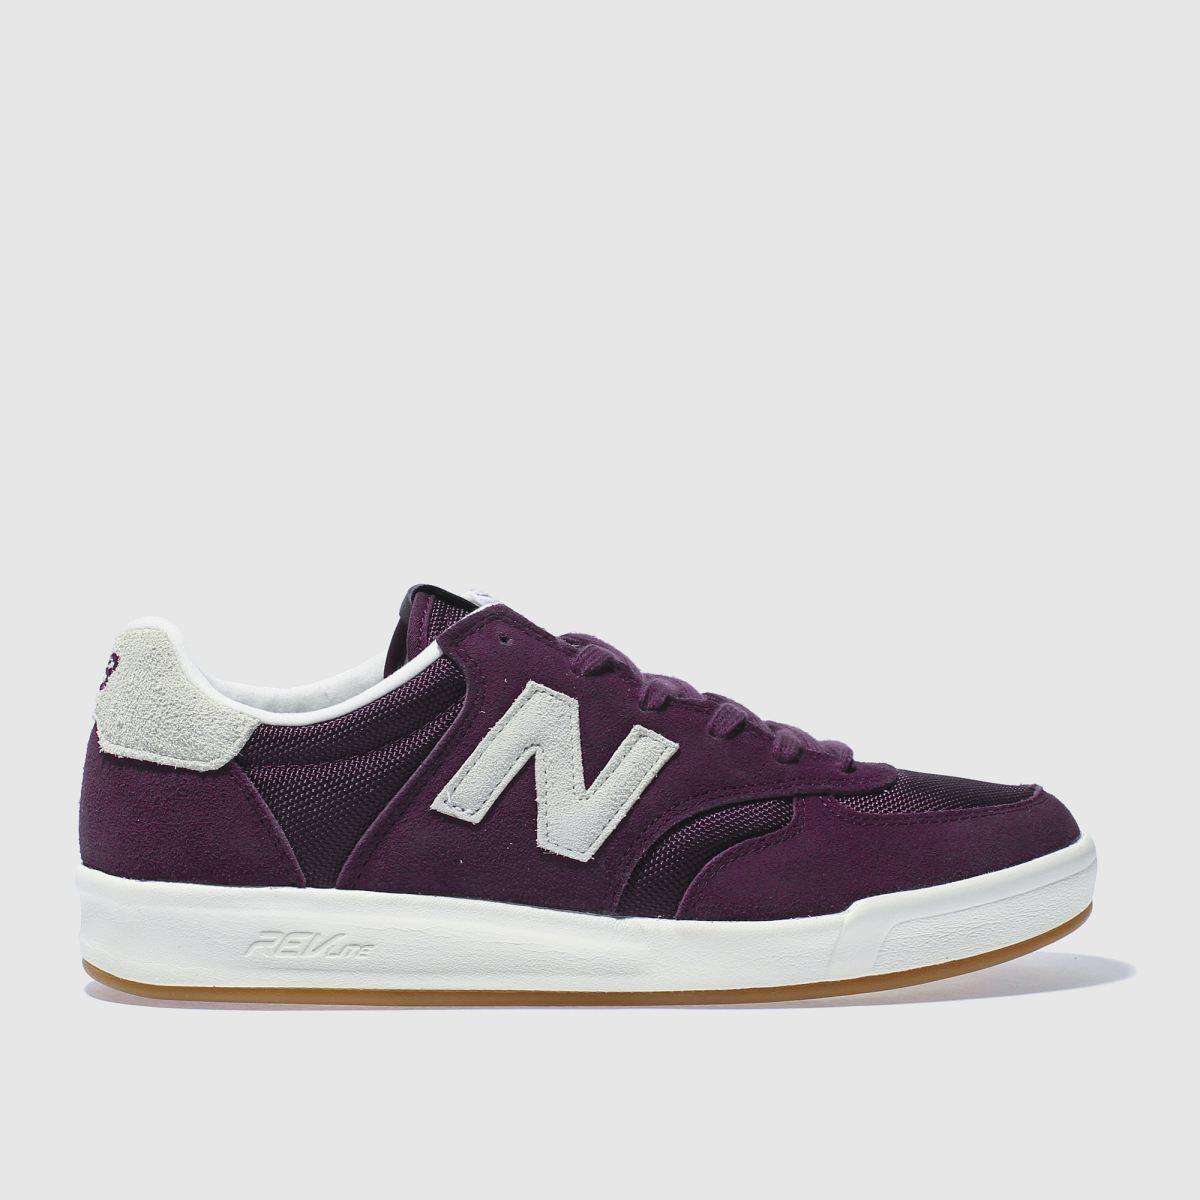 new balance purple 300 trainers